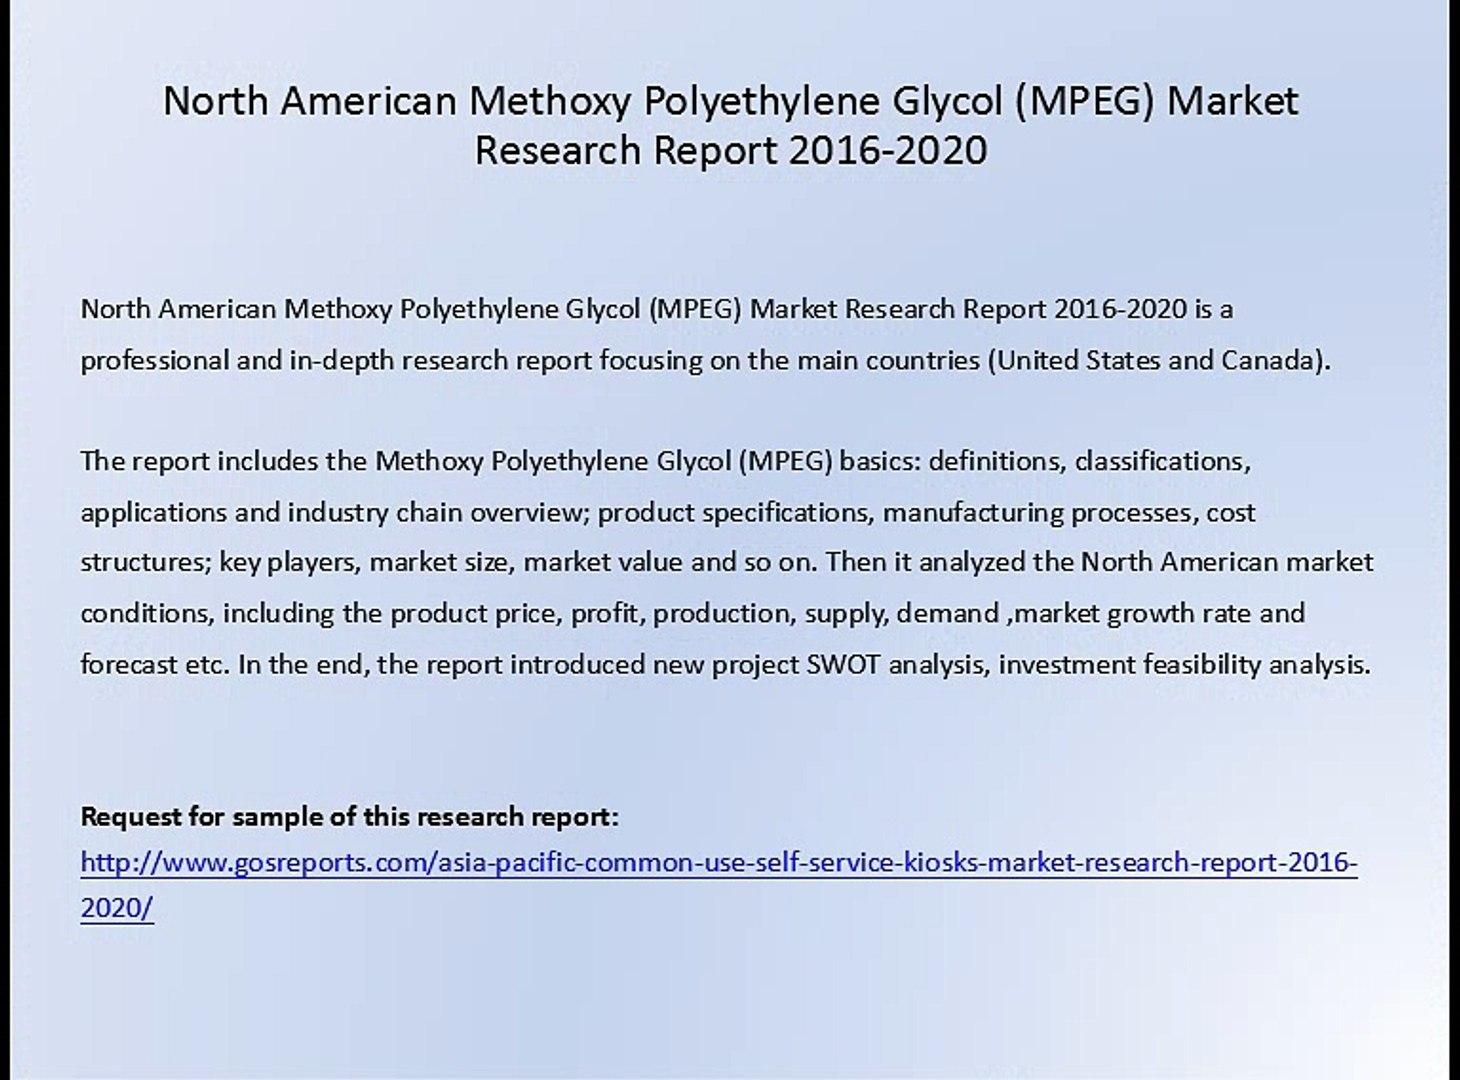 North American Methoxy Polyethylene Glycol (MPEG) Market Research Report  2016-2020